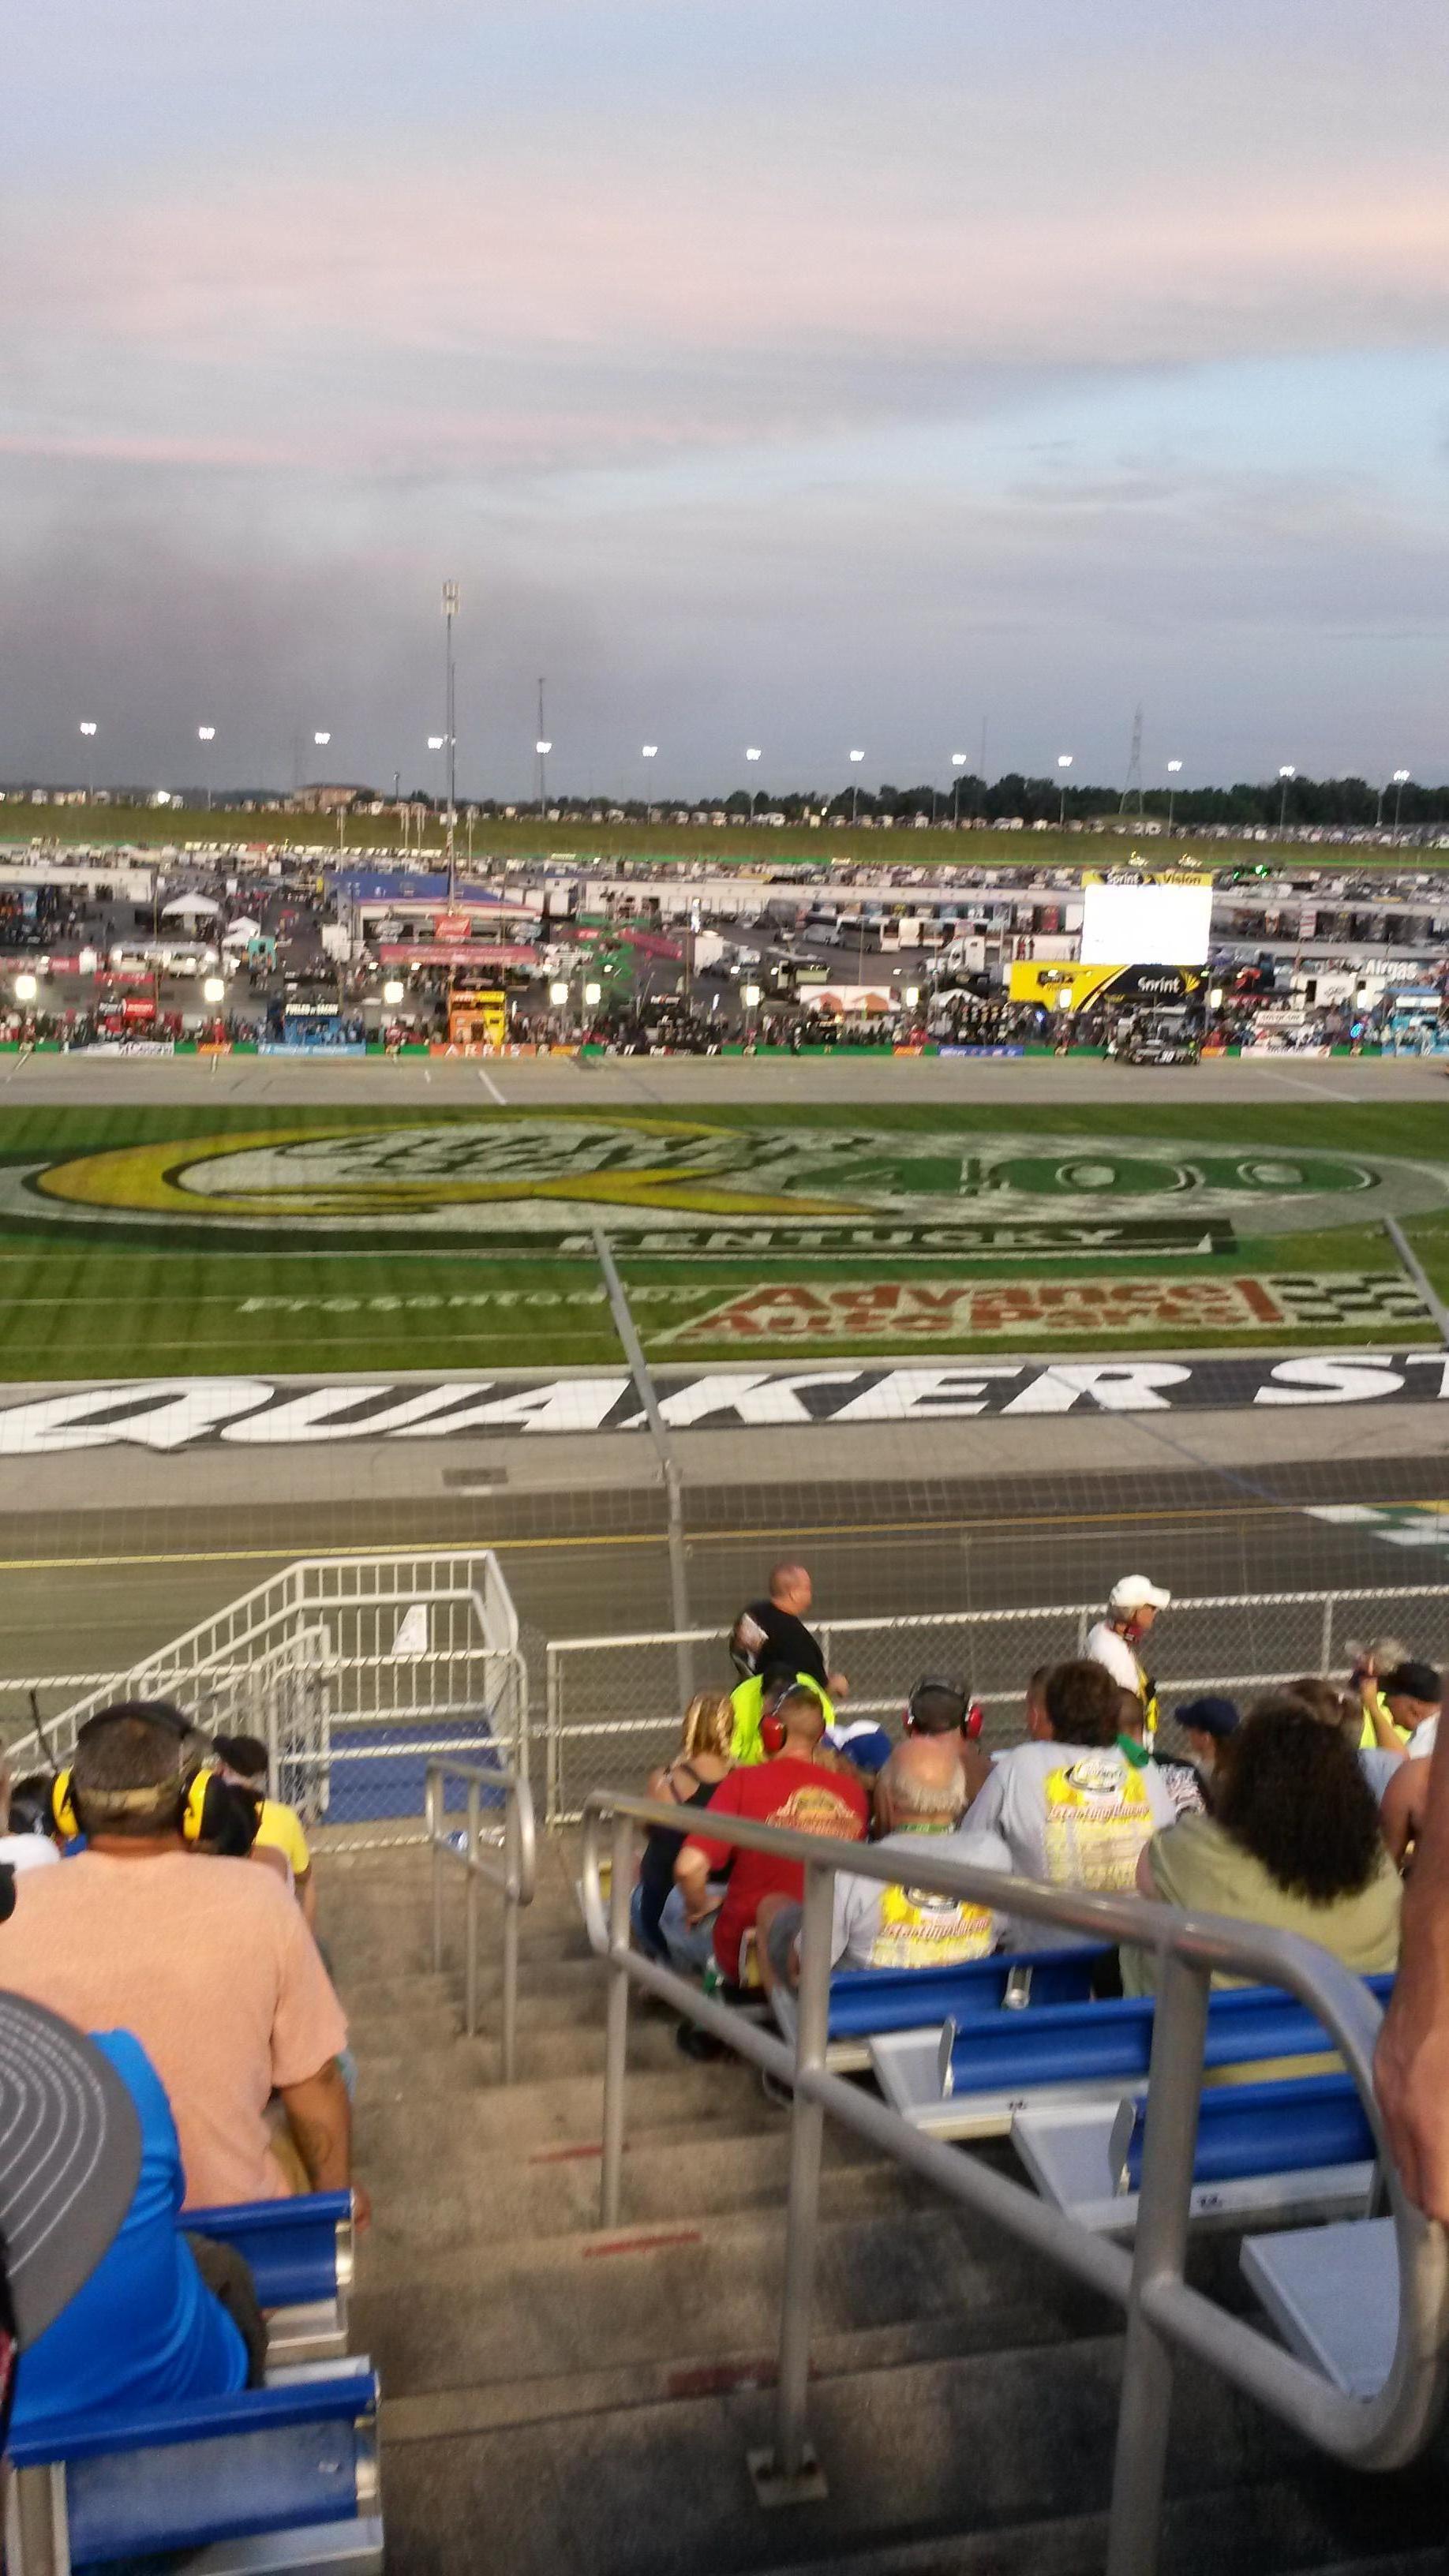 Kentucky Speedway Section GS4B Row 11 Seat 1